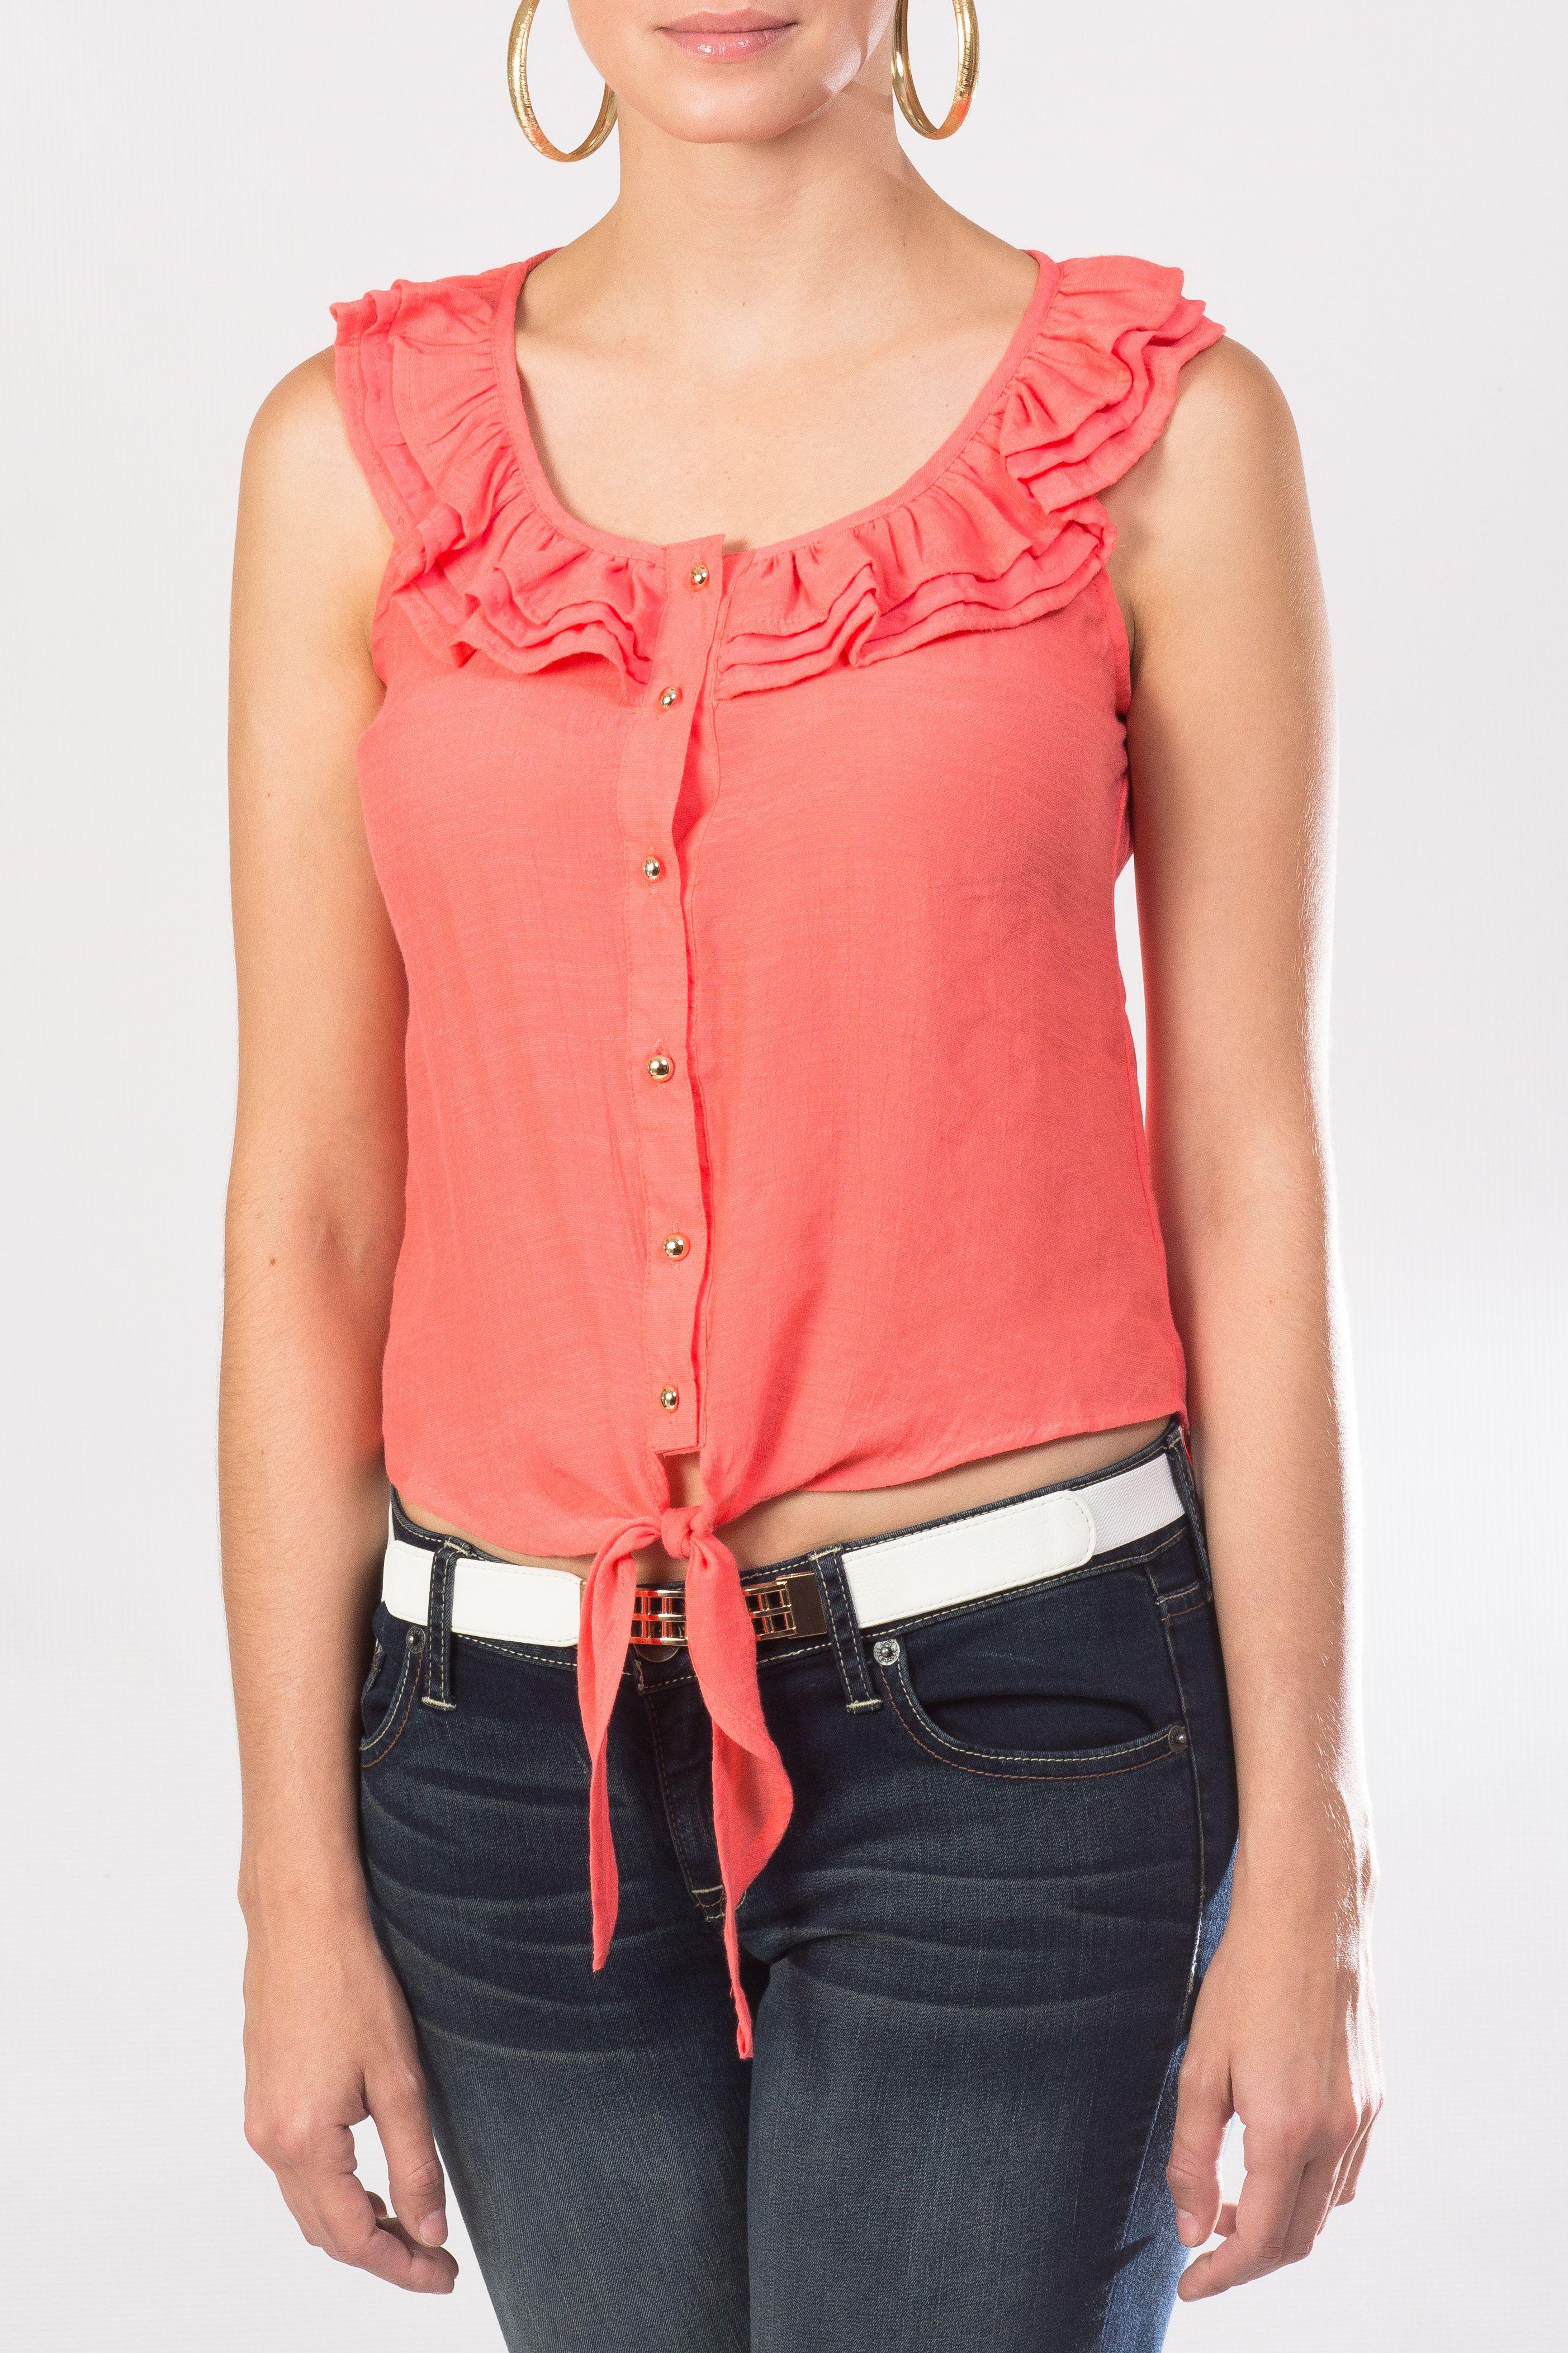 Luce esta maravillosa blusa sin mangas en color coral que - Colores para combinar ...